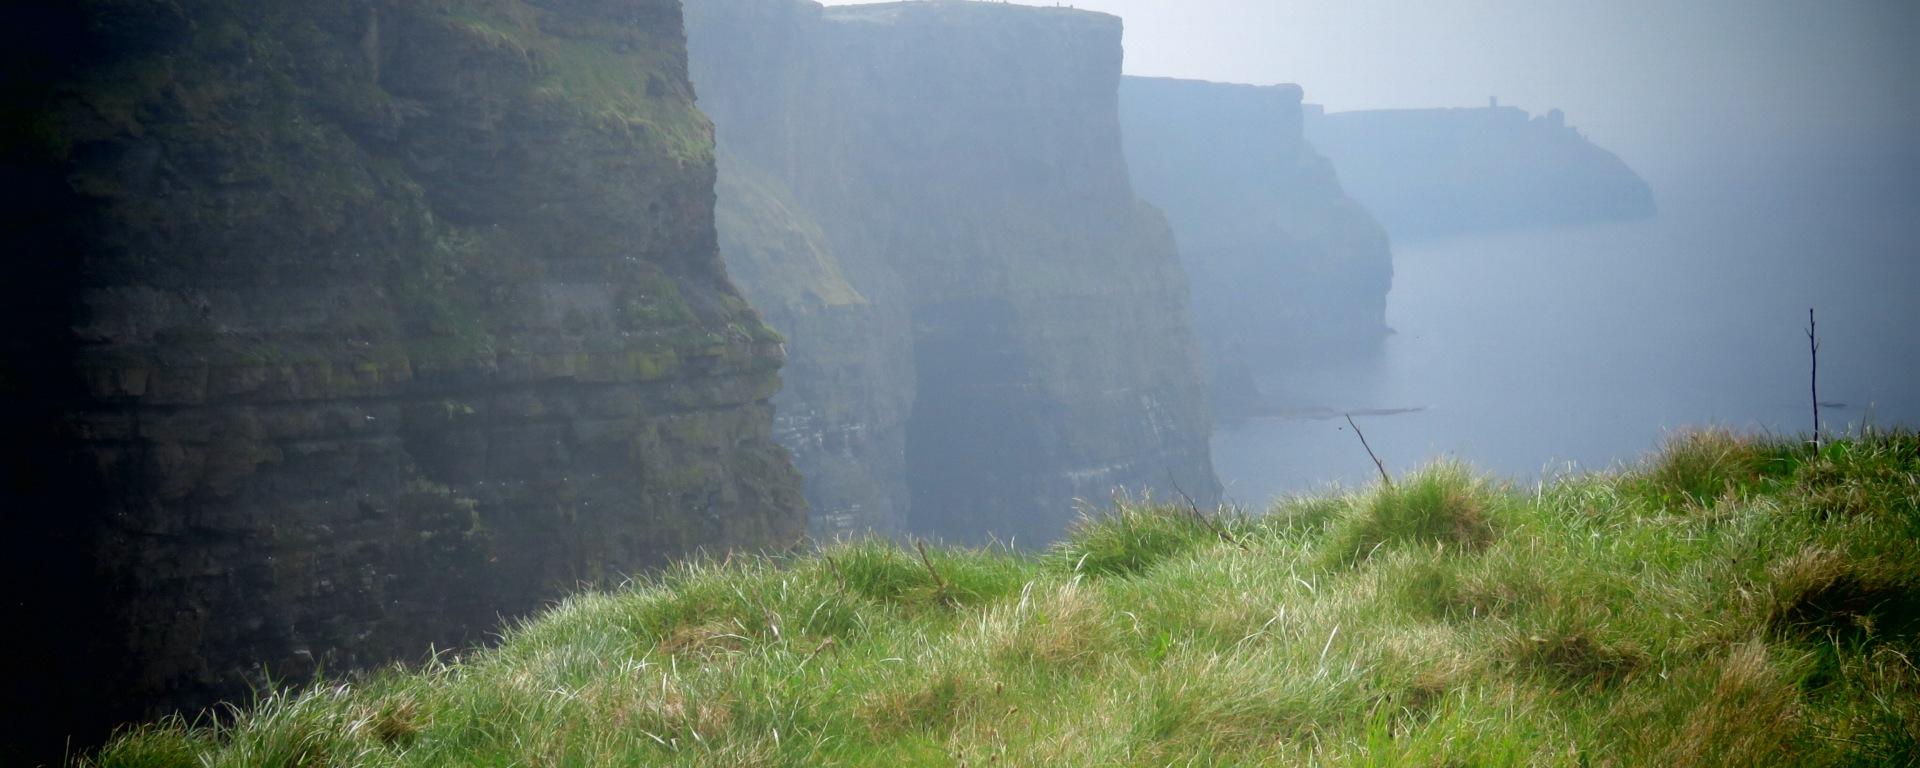 Tiny Tourists at the Cliffs of Moher Ireland - Shamrocker Adventure Tours - by Anika Mikkelson - Miss Maps - www.MissMaps.com